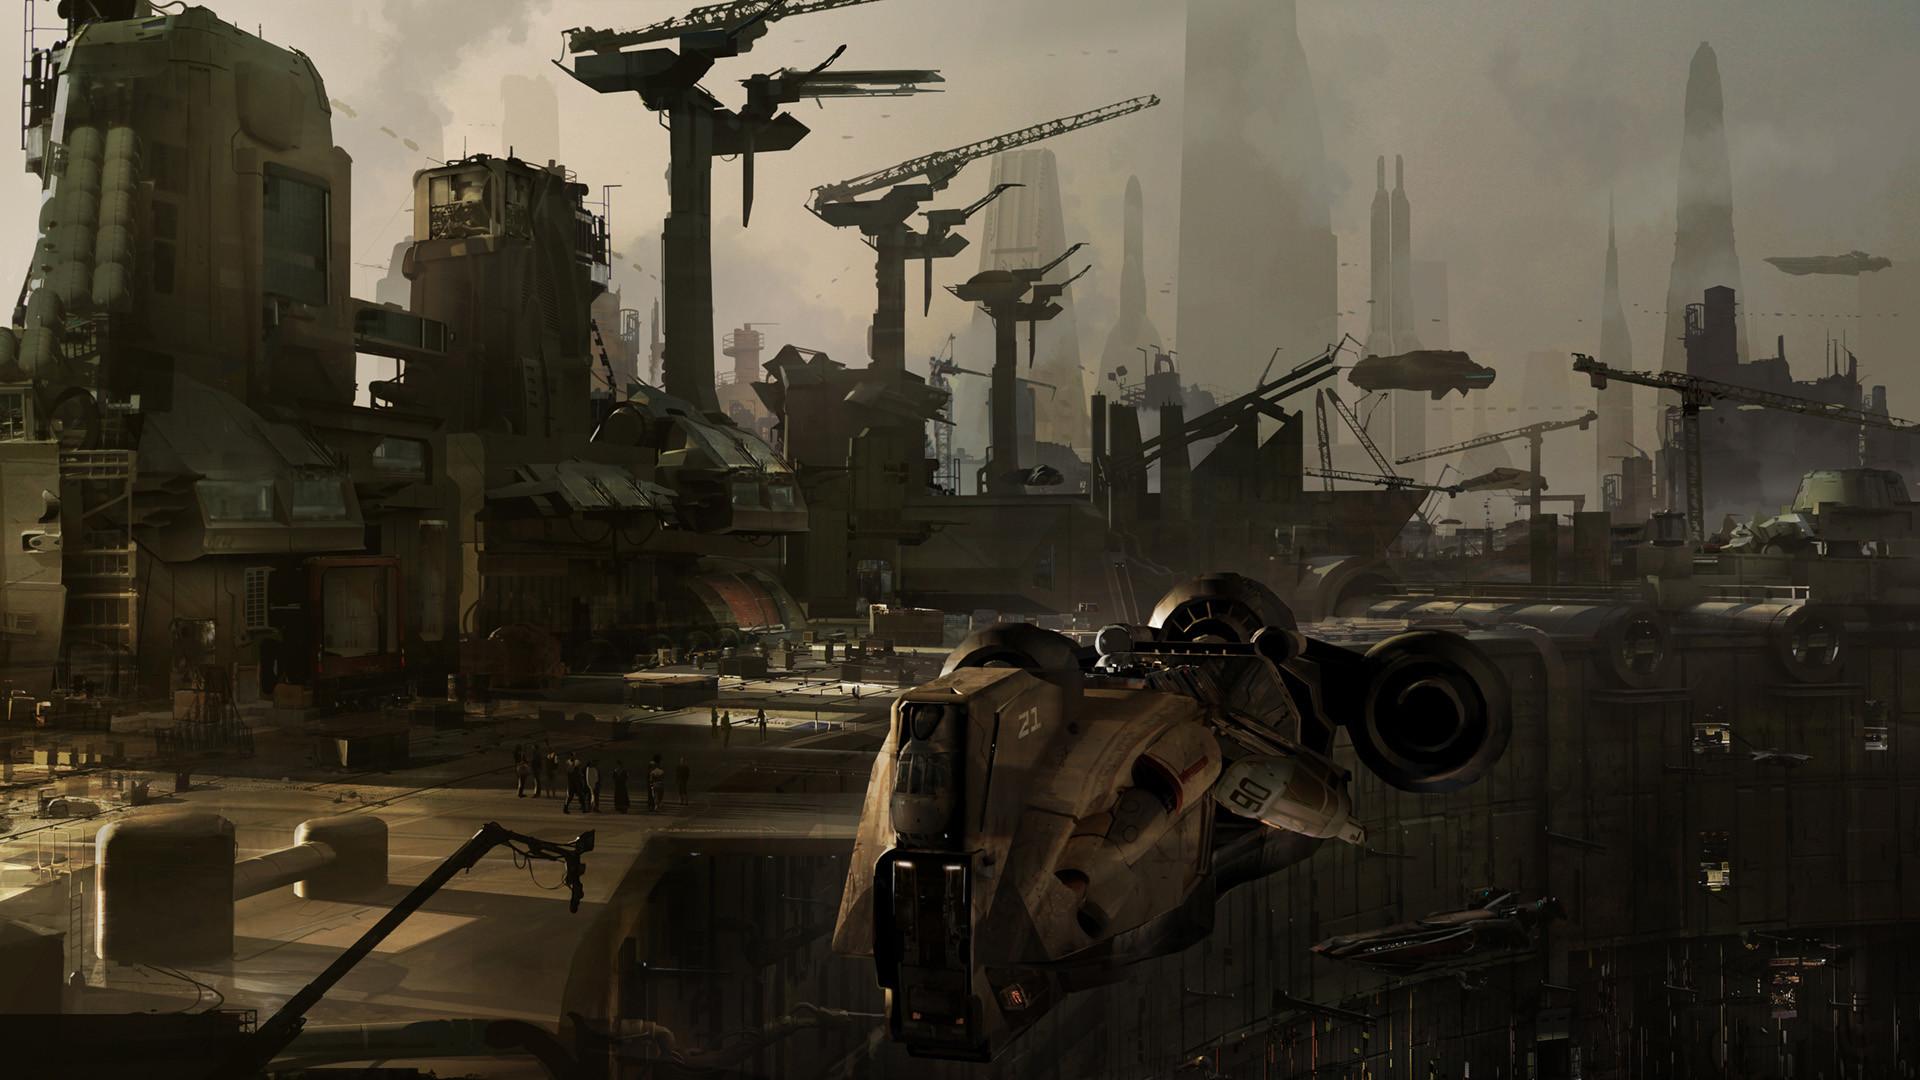 Coruscant underworld entrance – Star Wars 1313 – by Bruno Werneck